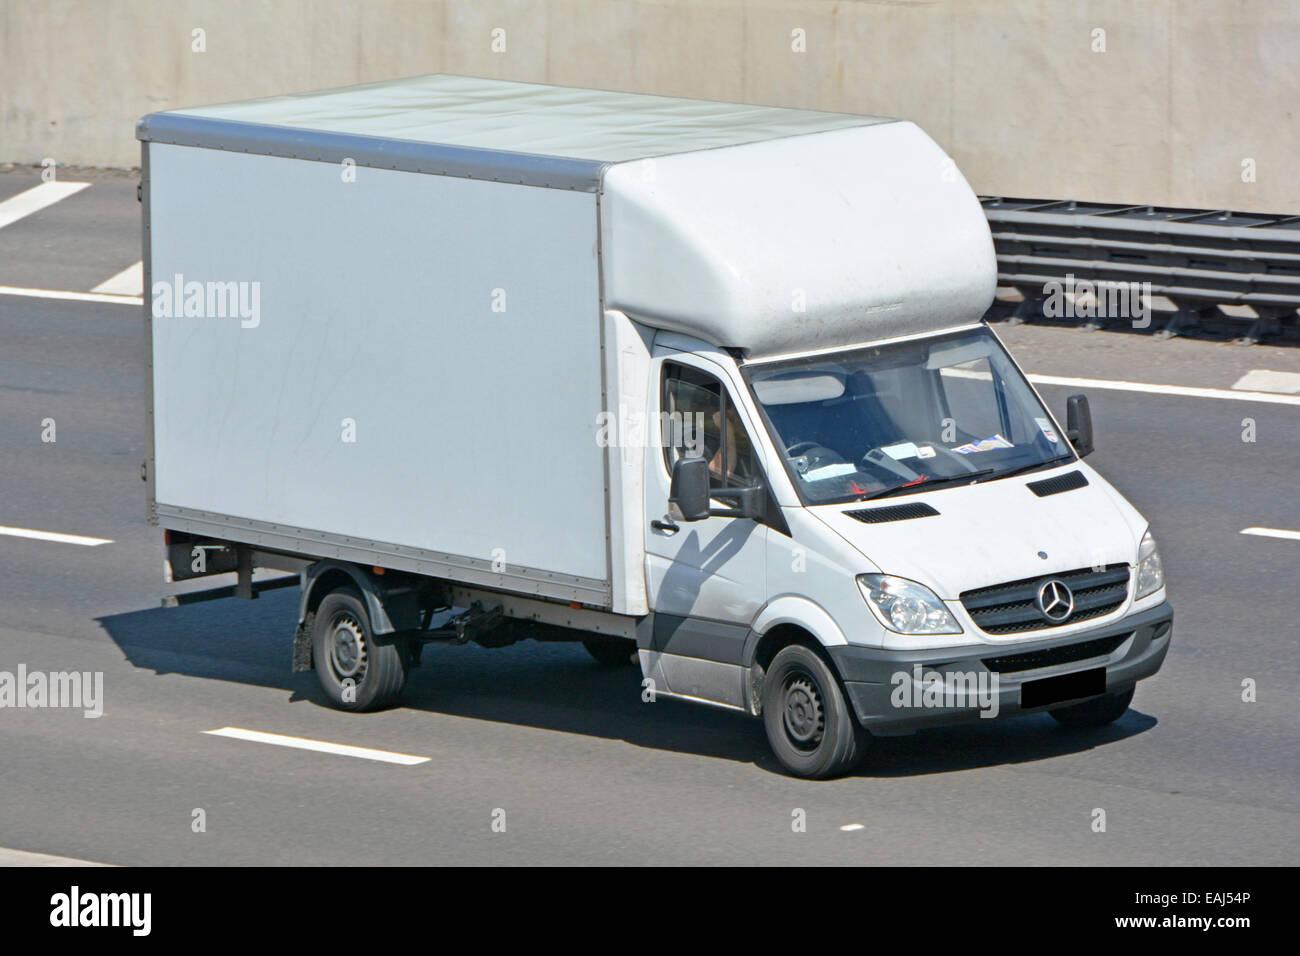 100 mercedes commercial van mercedes benz unveils for Mercedes benz commercial van